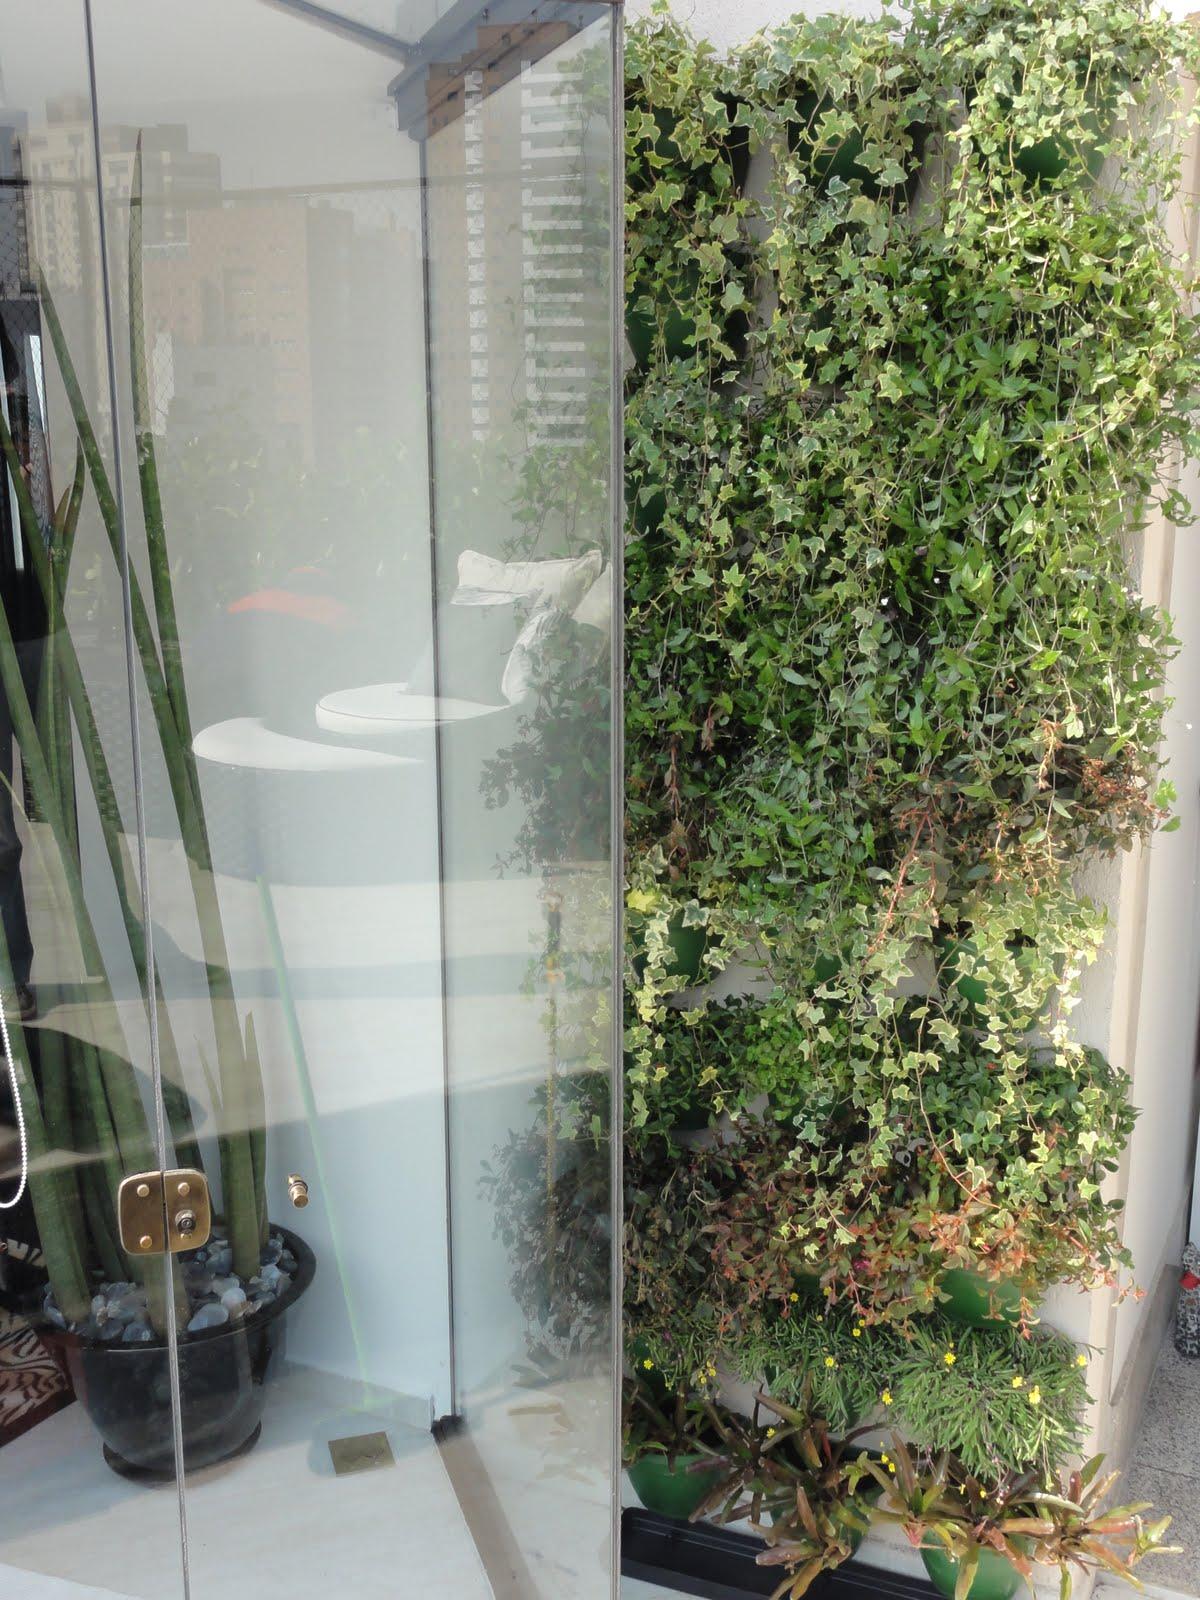 jardim vertical simples : jardim vertical simples:Blog da Paisagista: Jardim Vertical – Simples assim